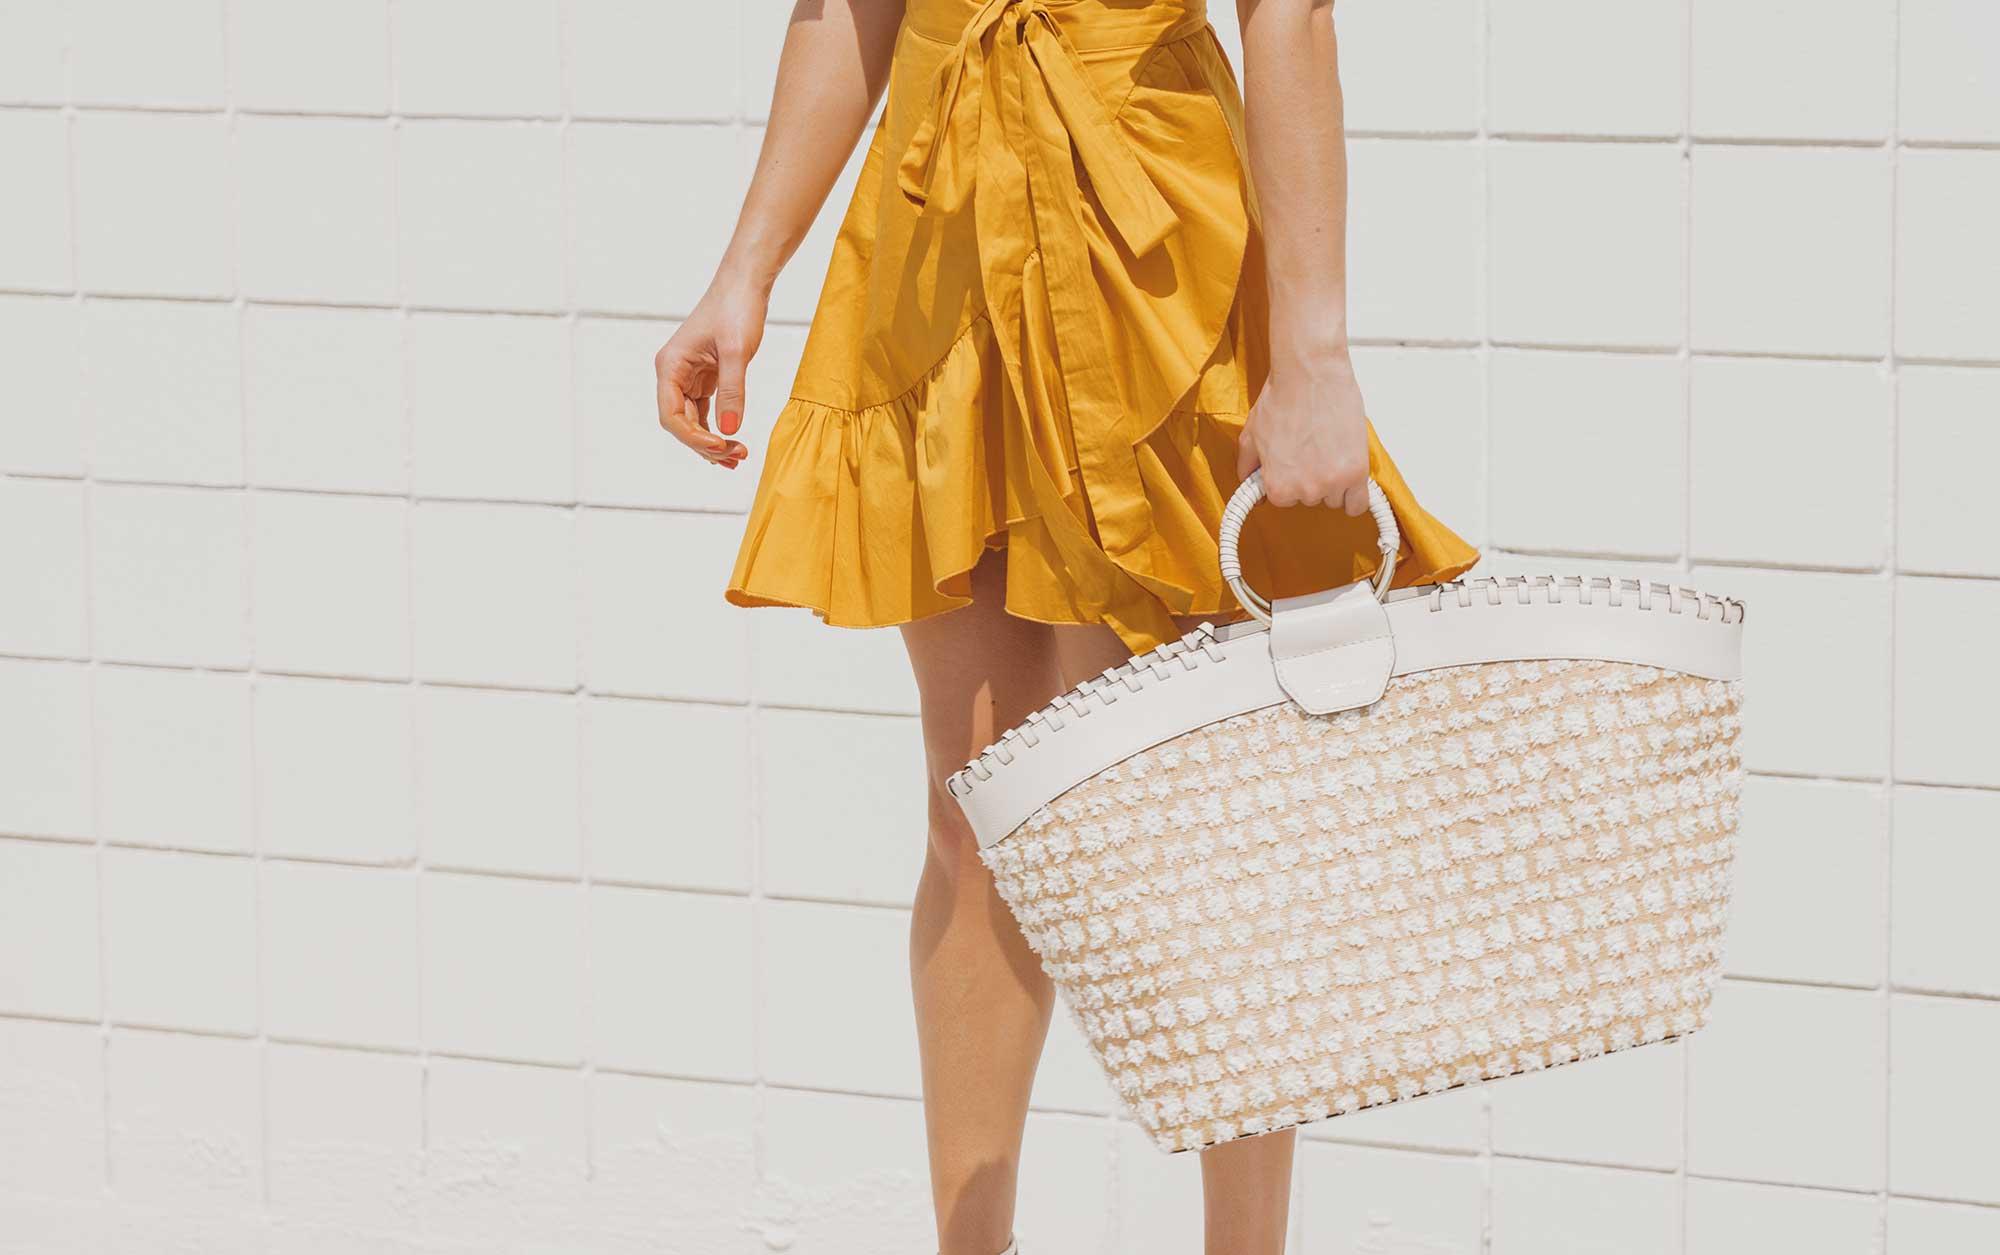 Cynthia Rowley Short sleeve cotton ruffle wrap dress Palm Springs Outfit11.jpg